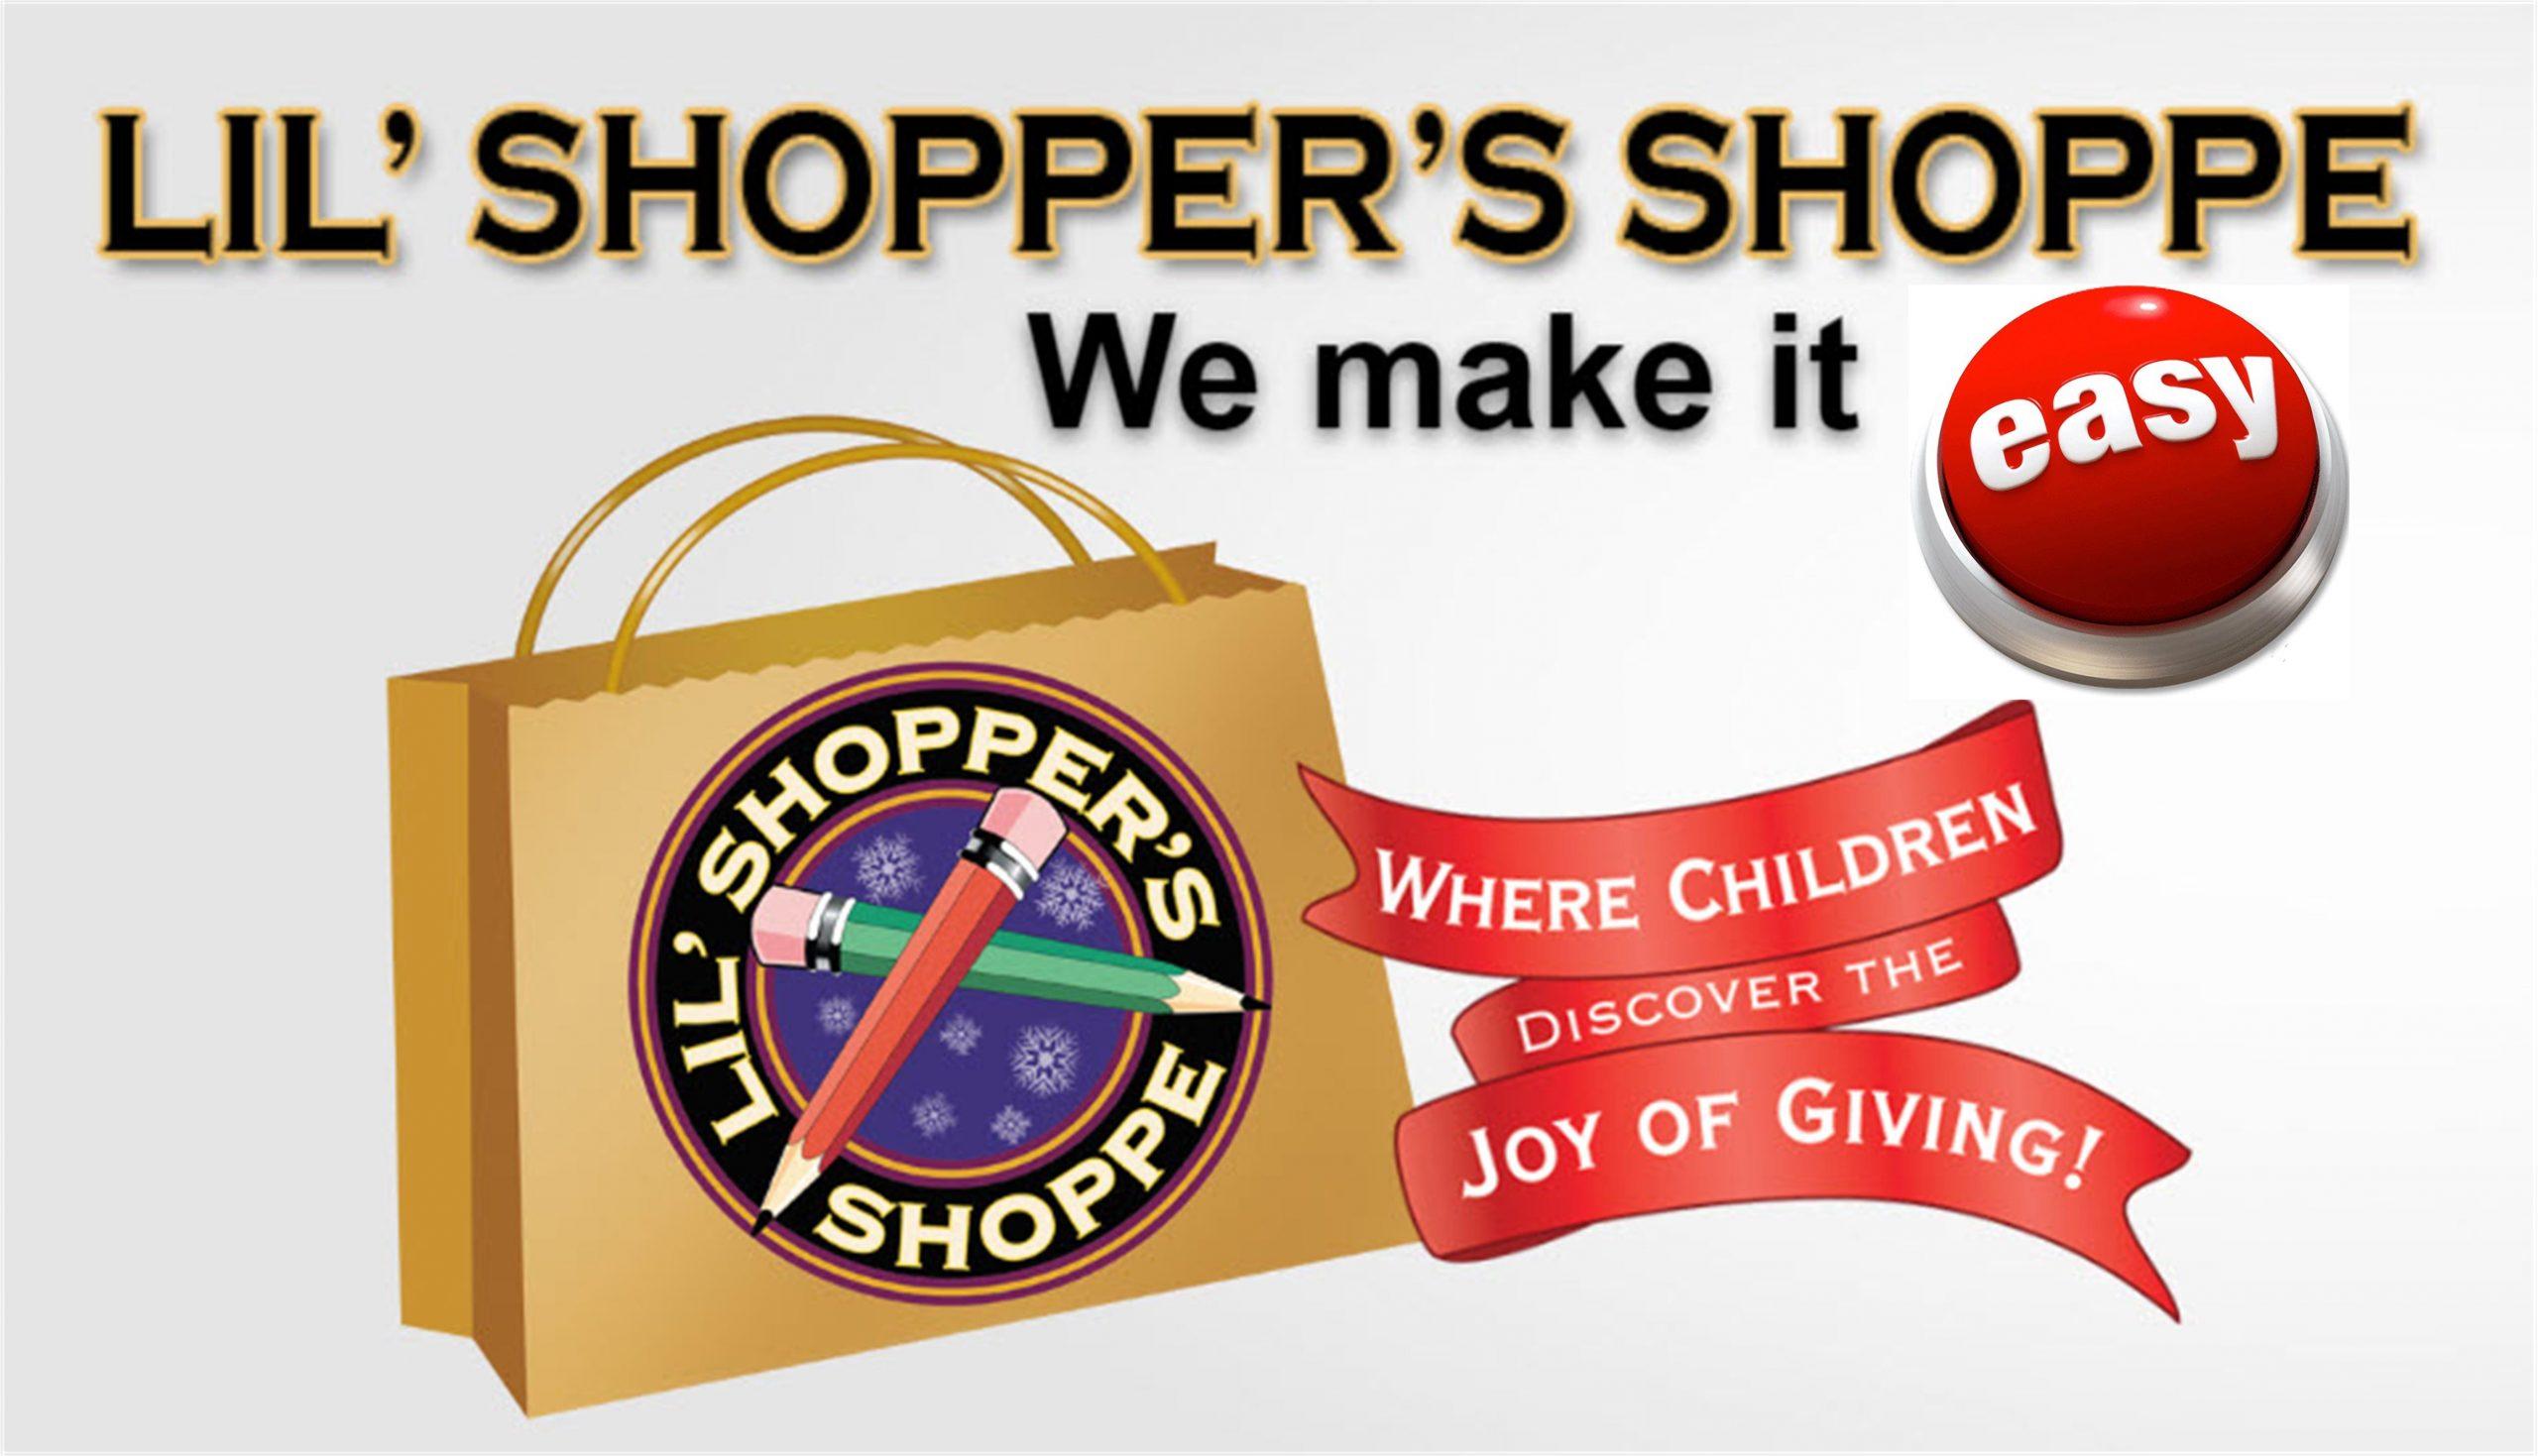 Lil Shopper's Shoppe We Make It Easy